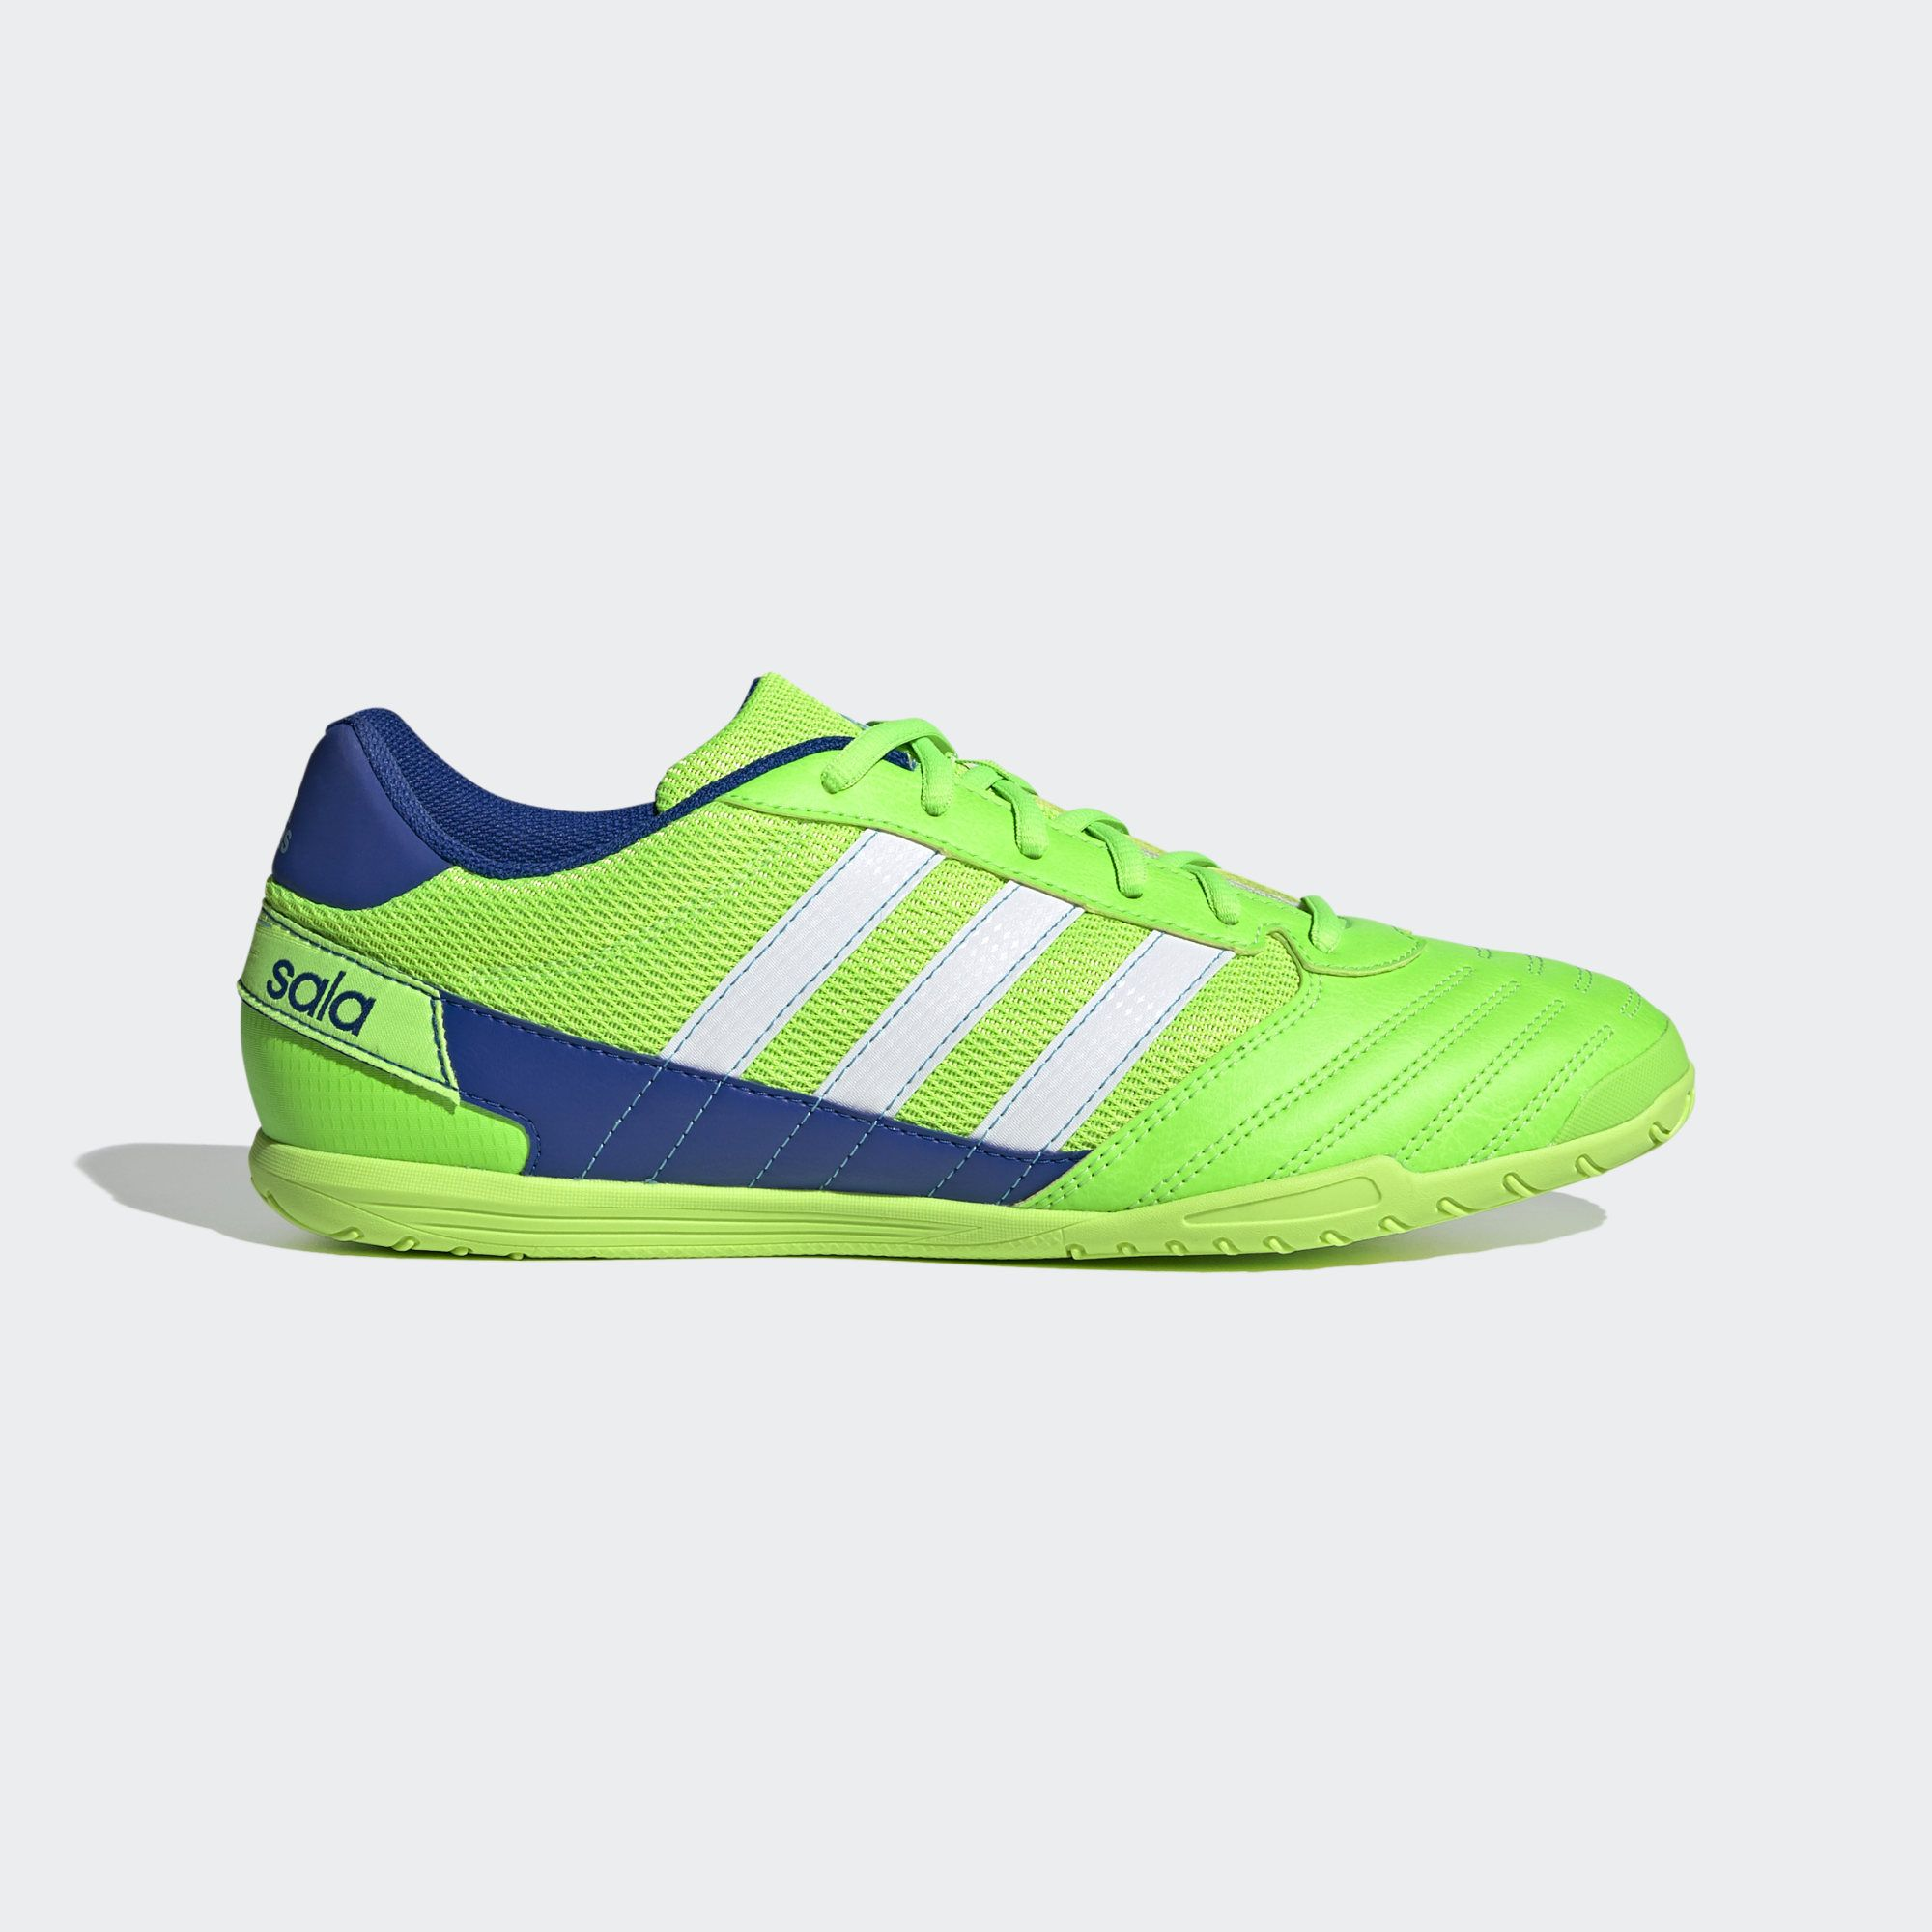 sala football boots off 64% - filetrack